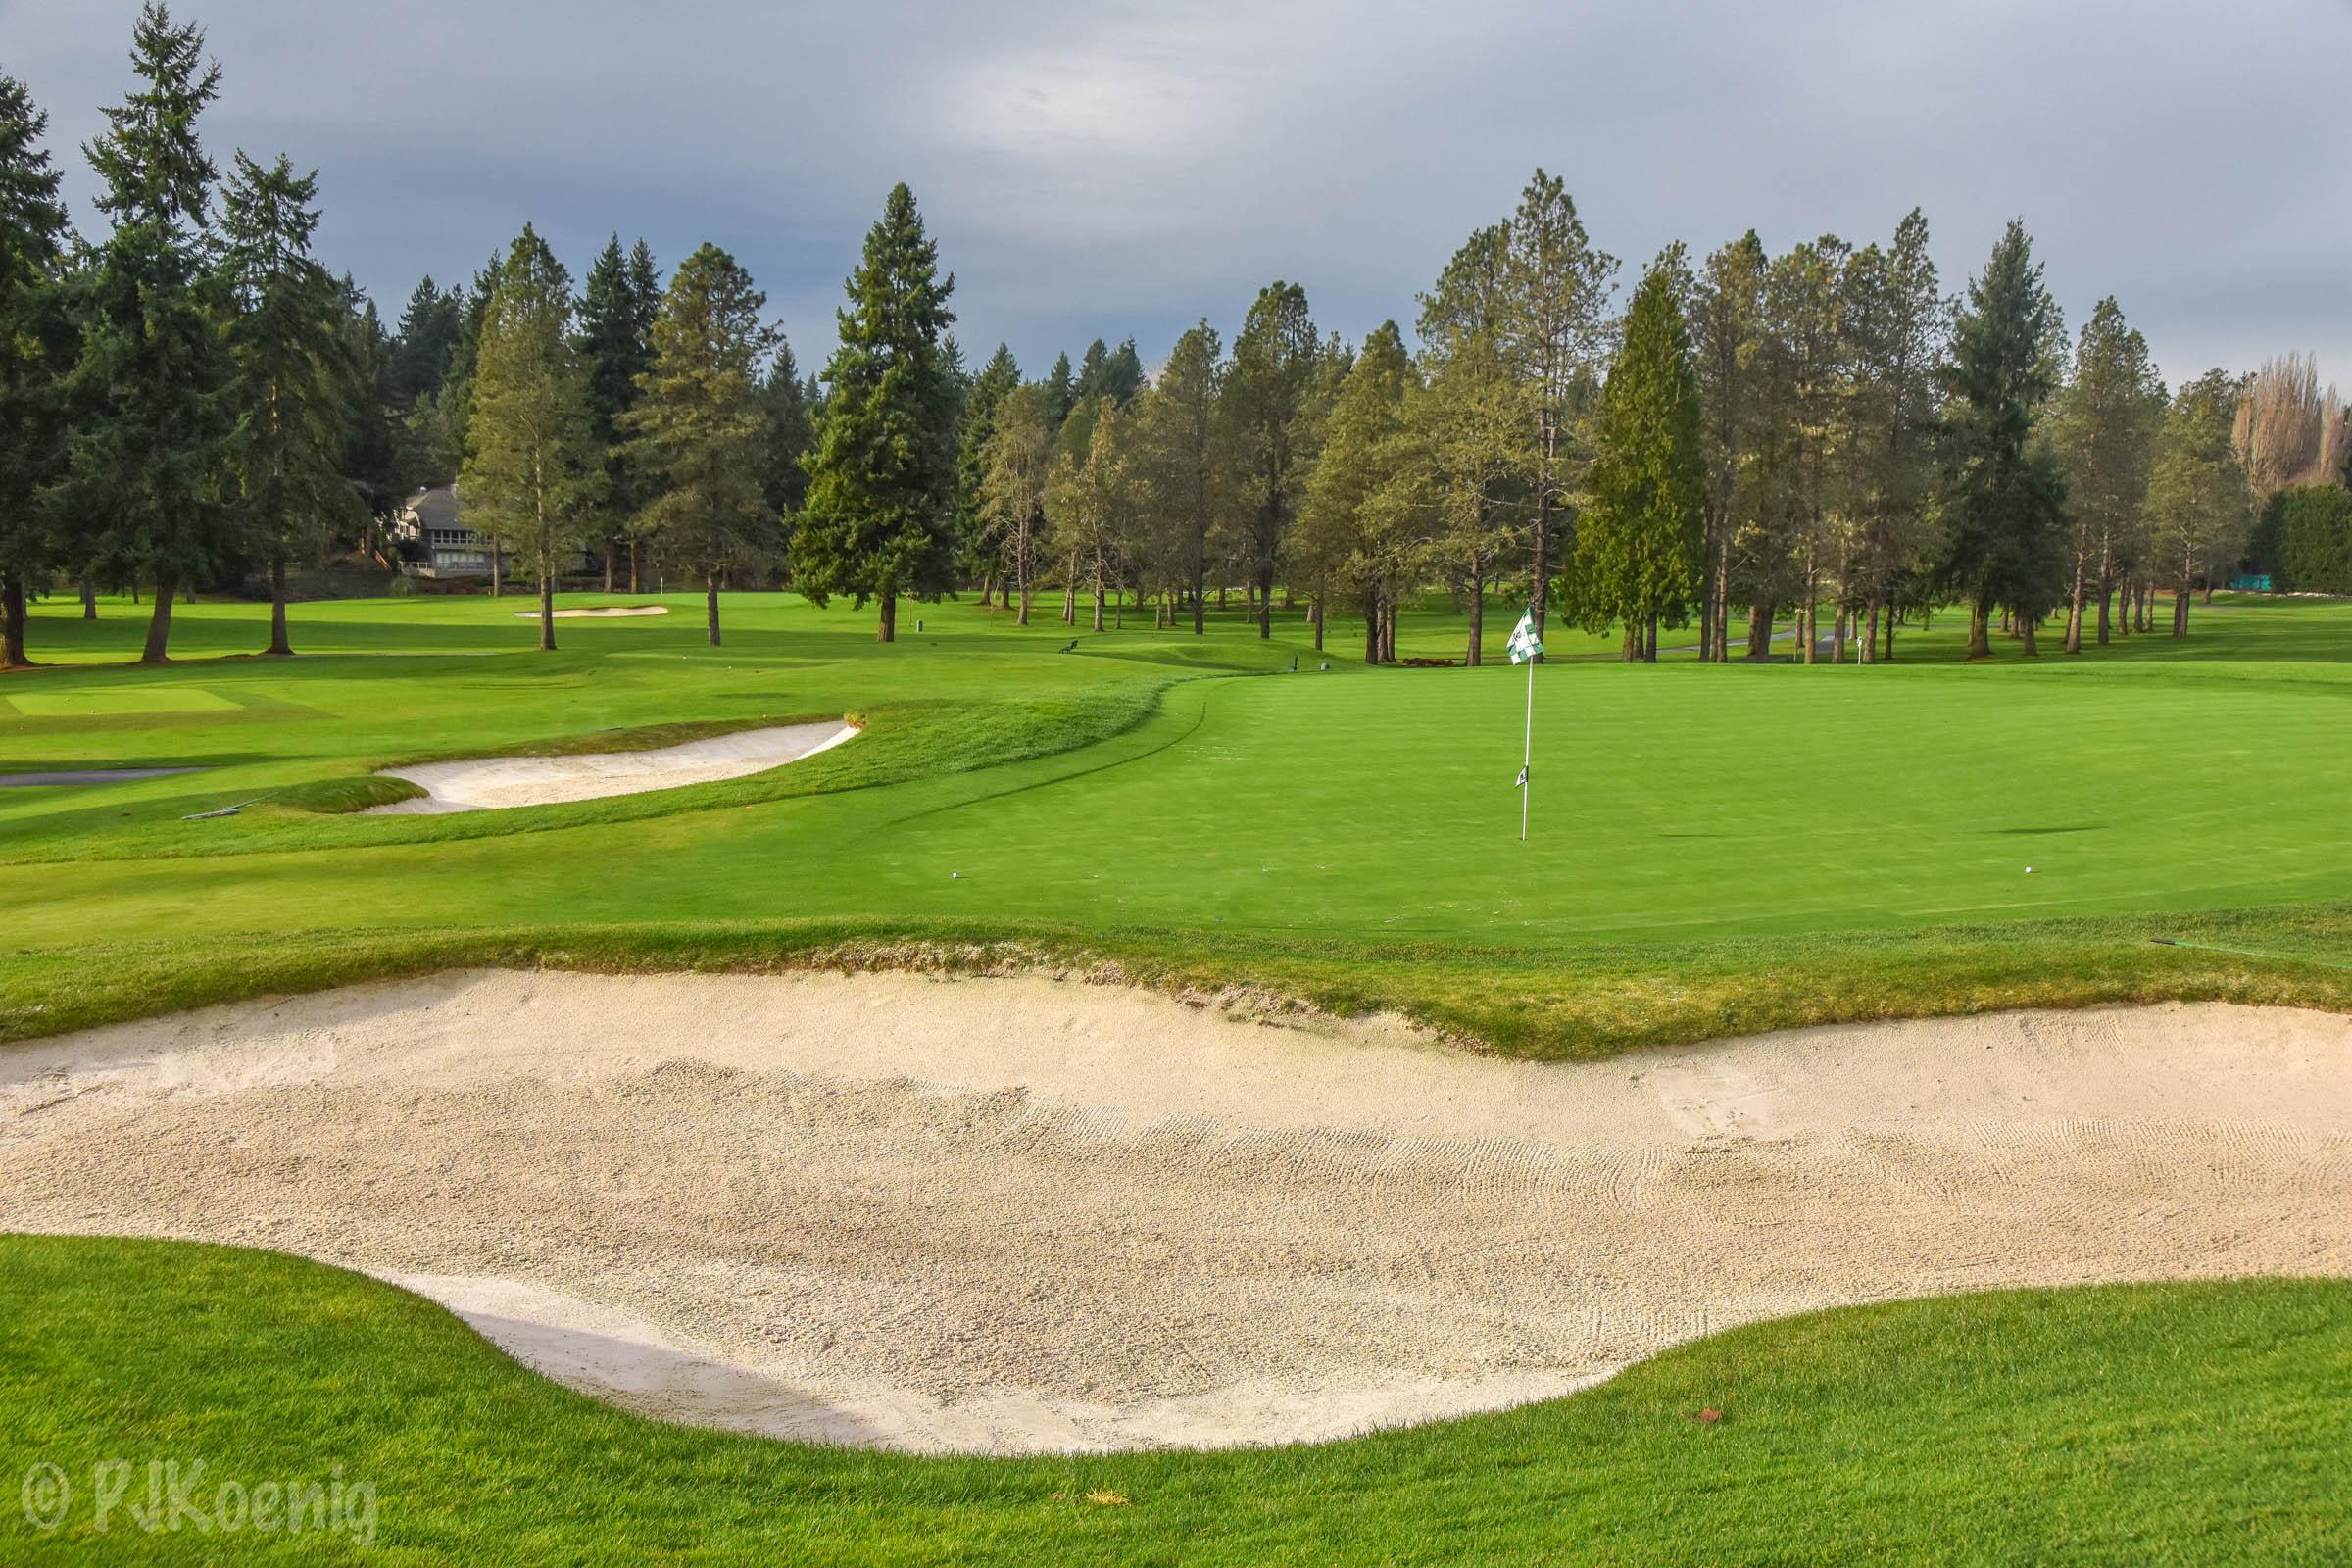 Glendale Country Club - Bellevue, WA